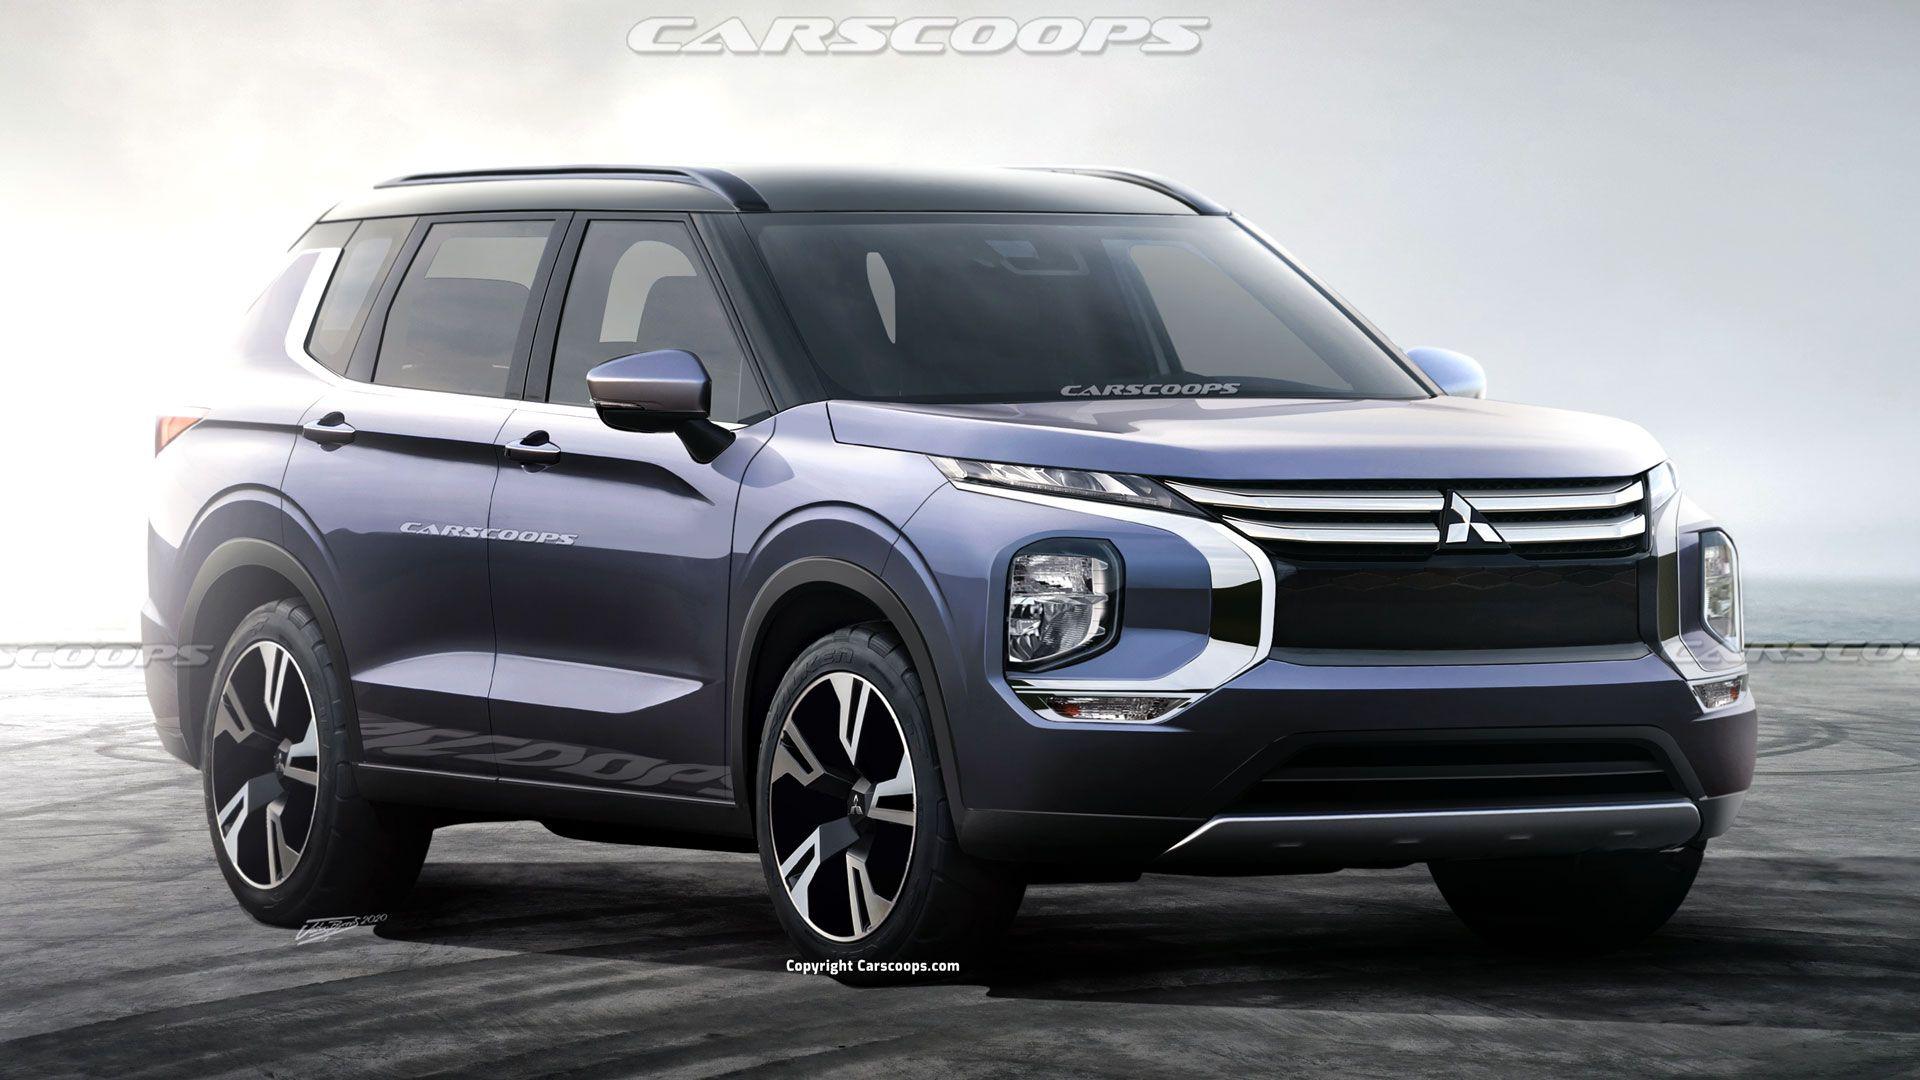 Promo Harga Kredit Terbaru 2019 Mitsubishi All New Pajero Sport Dakar Area Jember Banyuwangi Lumajang Situbondo Bondowoso Dan Probolin Truk Mobil Kendaraan